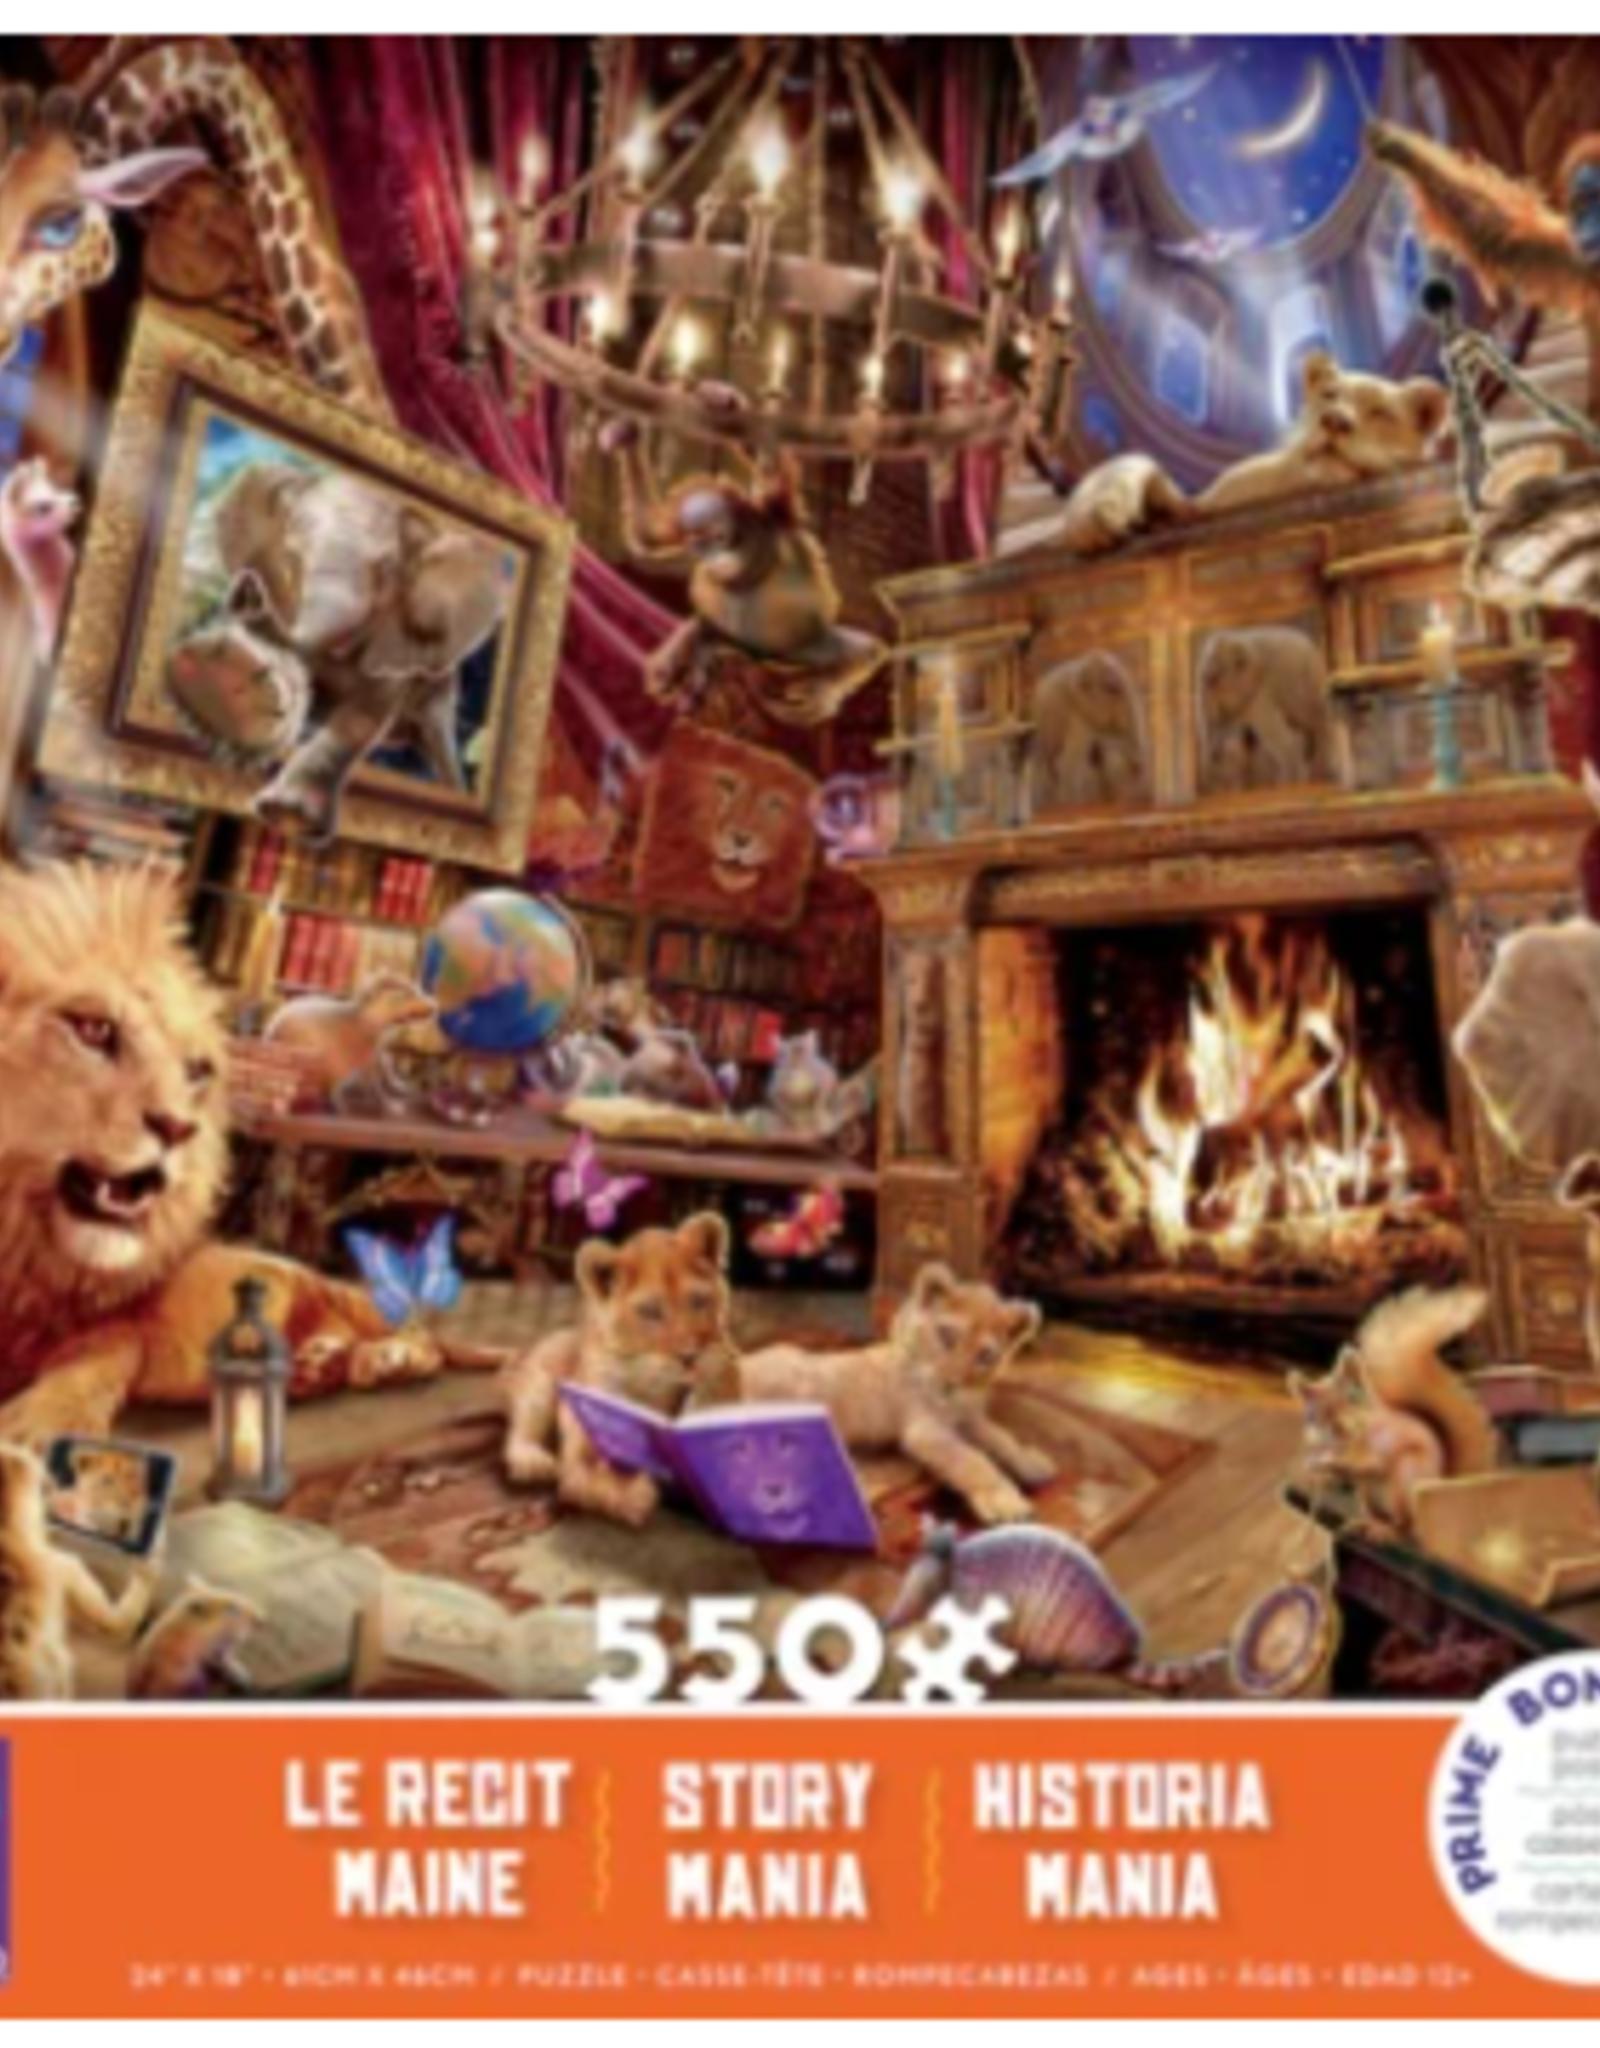 CEACO 550 pc puzzle - Story Mania